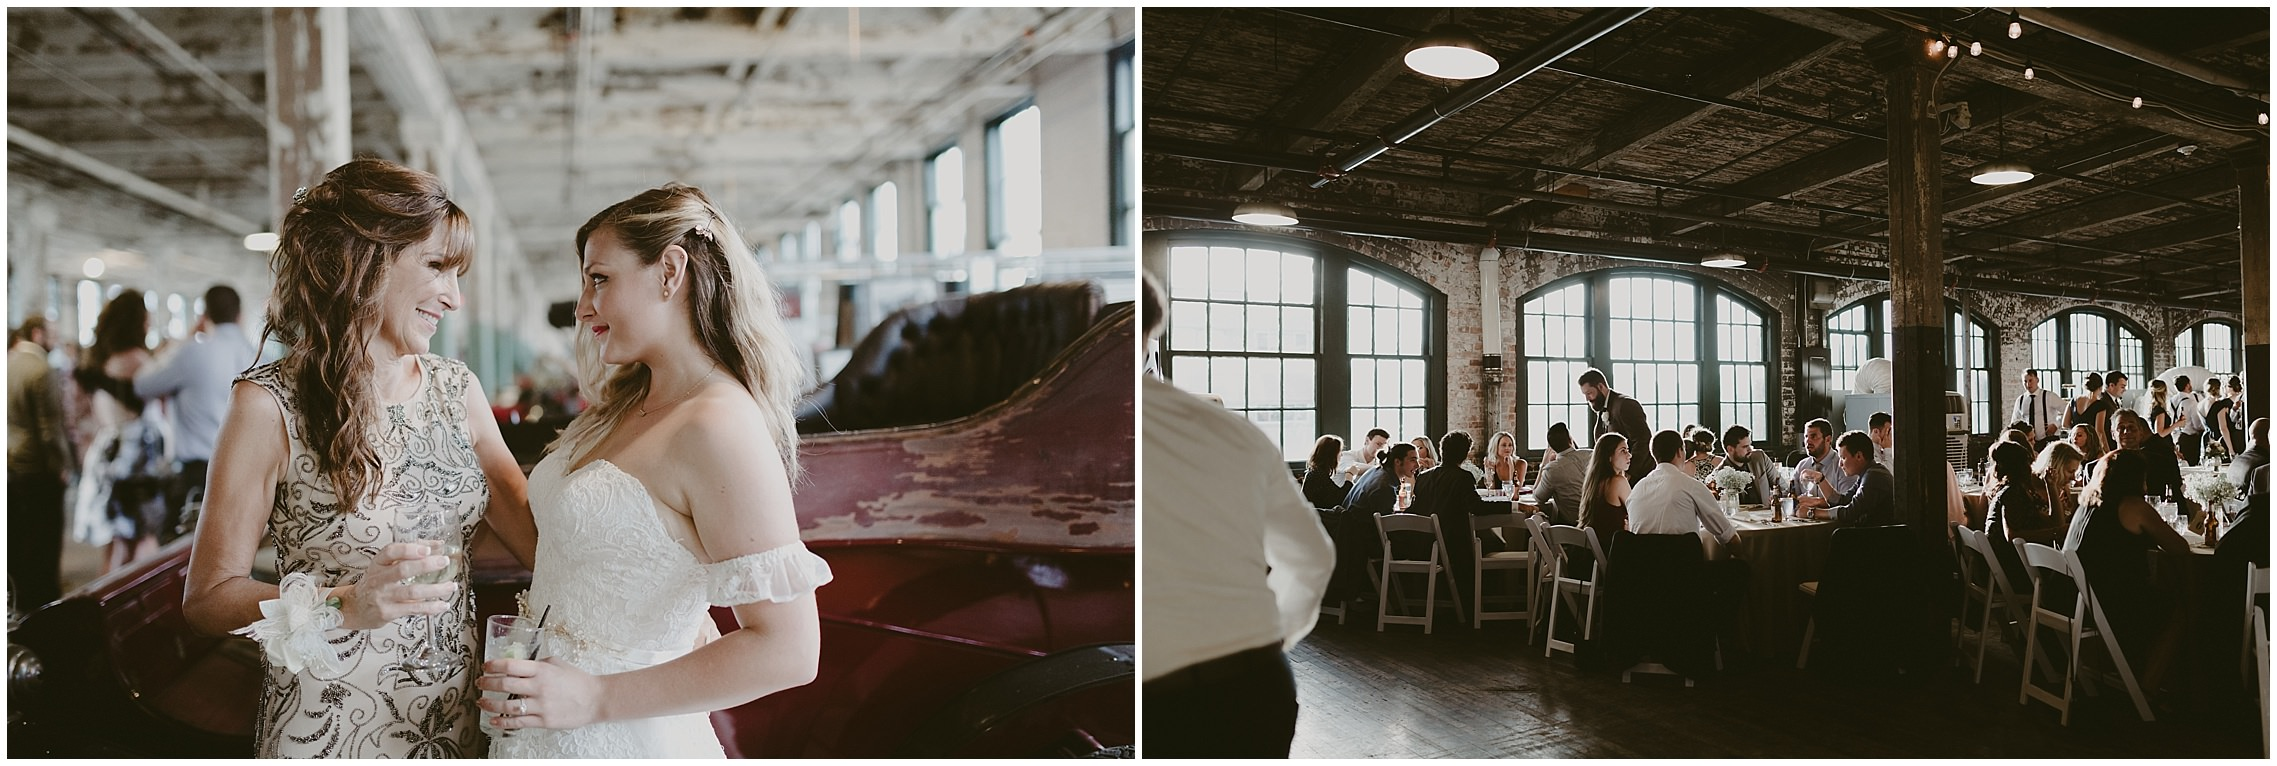 brick_and_mortar_colorado_wedding_photographer_0261.jpg